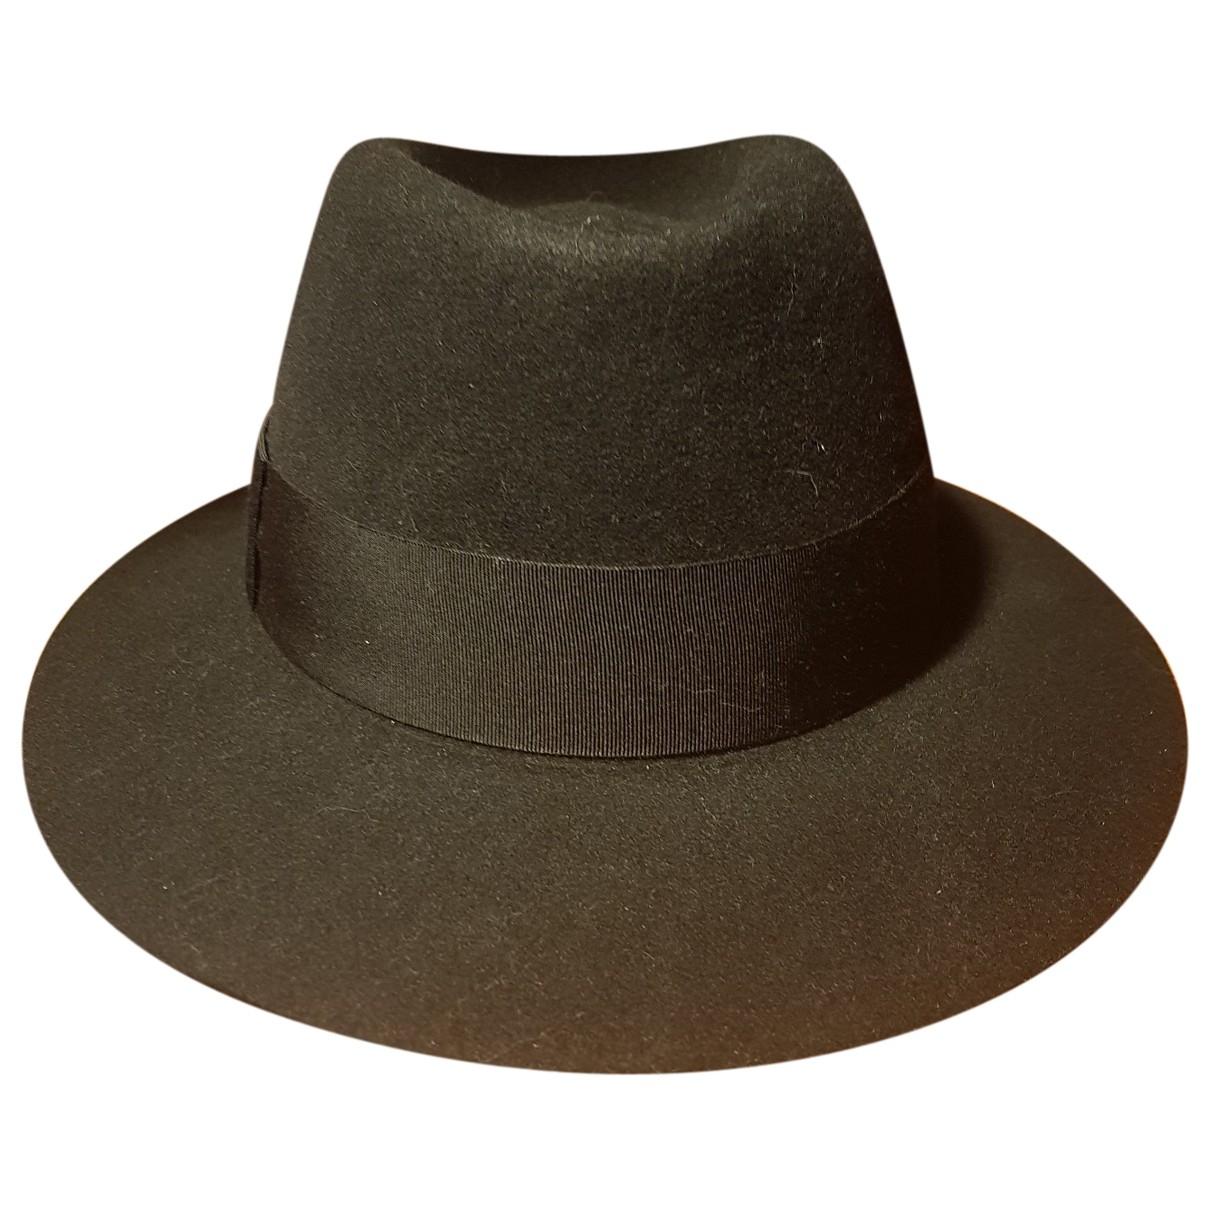 Saint Laurent \N Black Wool hat for Women S International